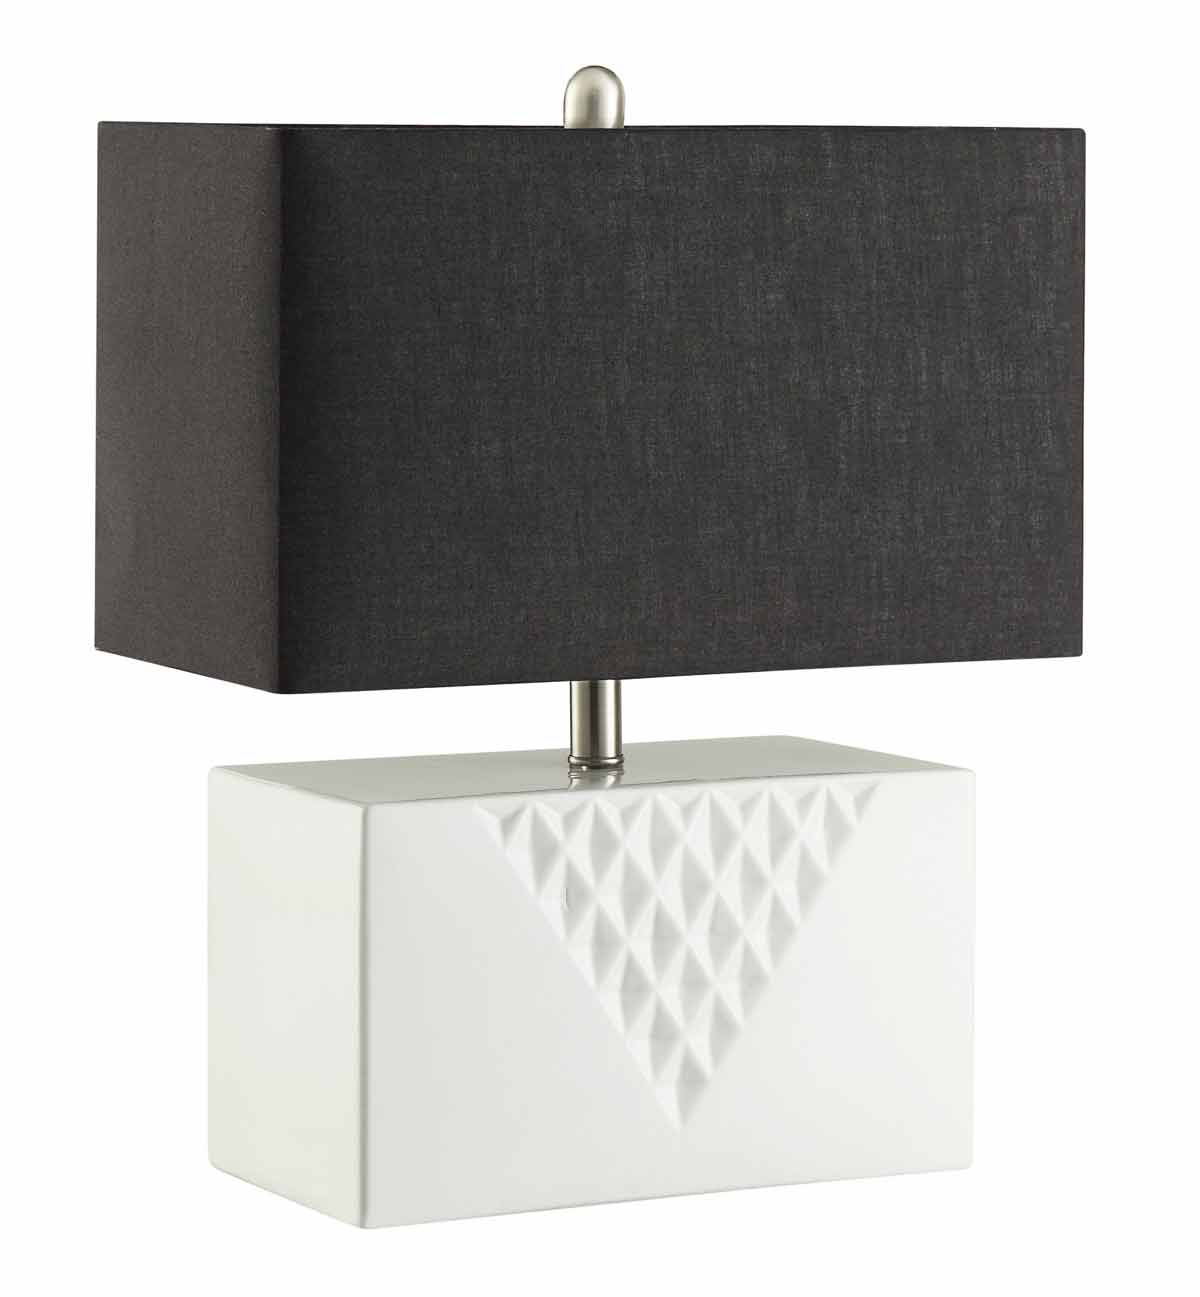 Coaster 901522 Table Lamp - White